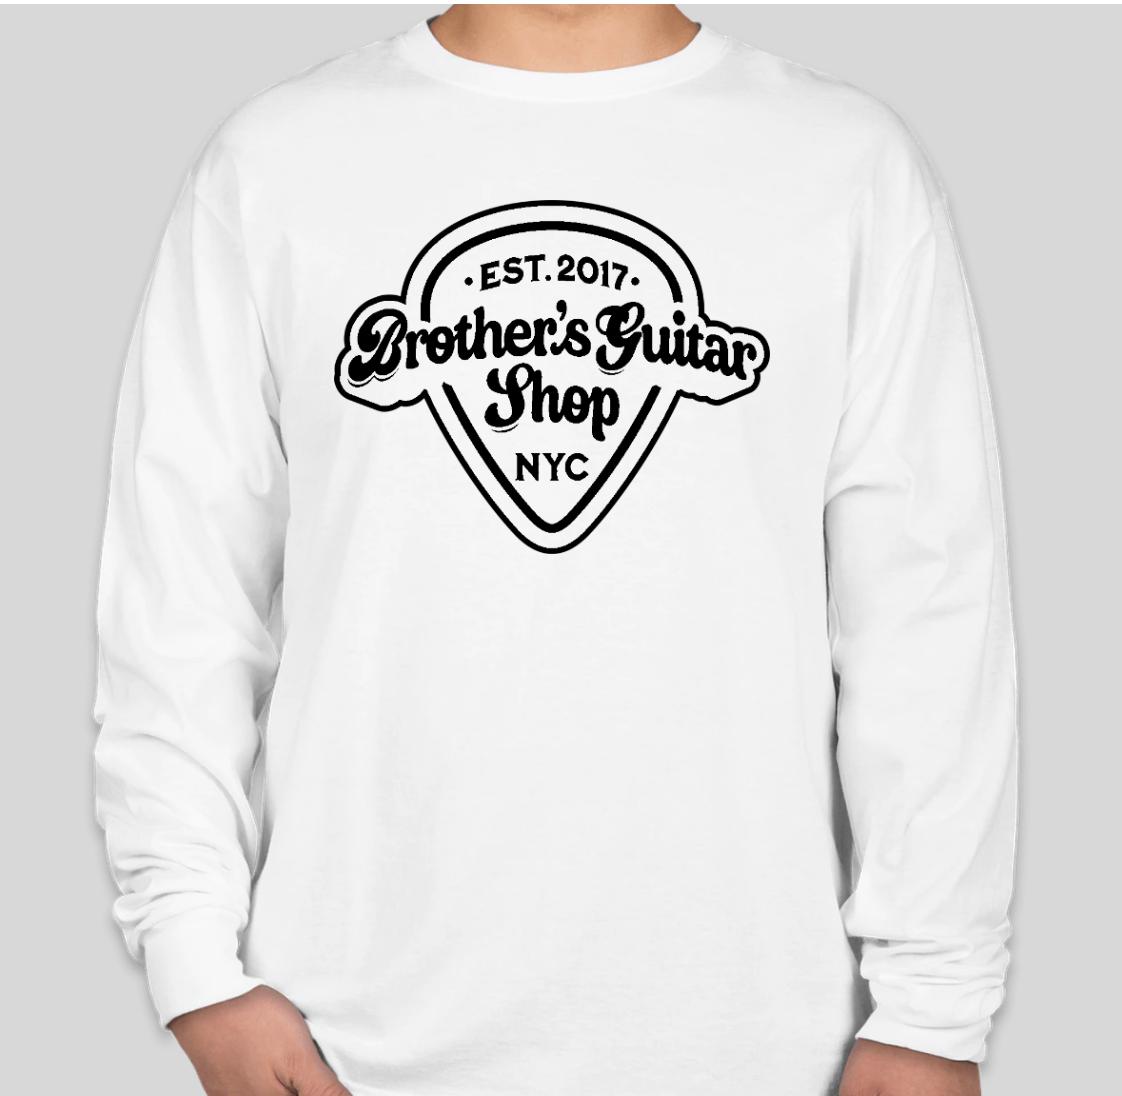 Brothers Logo T-Shirt Long White